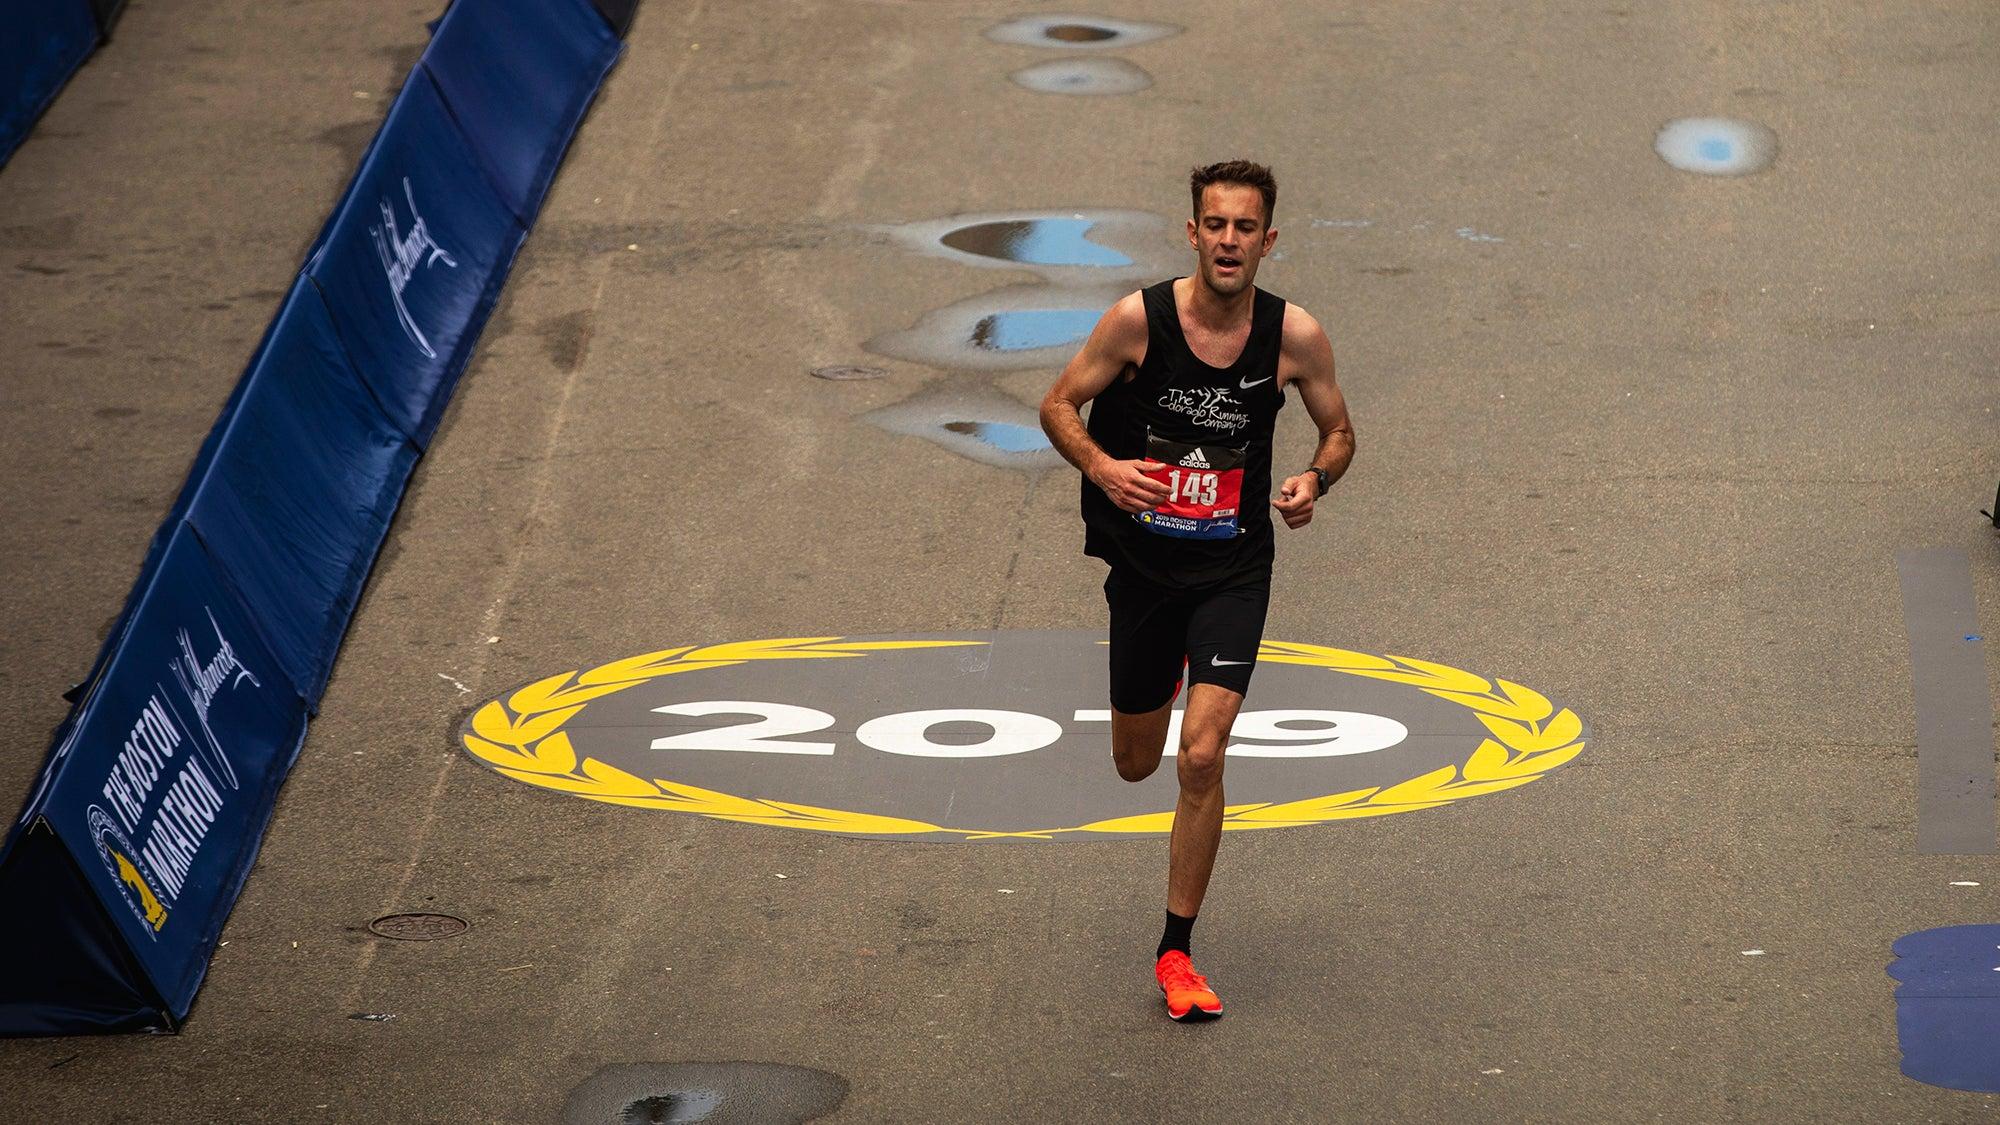 Stephen VanGampleare finishes the Boston-Marathon 2019